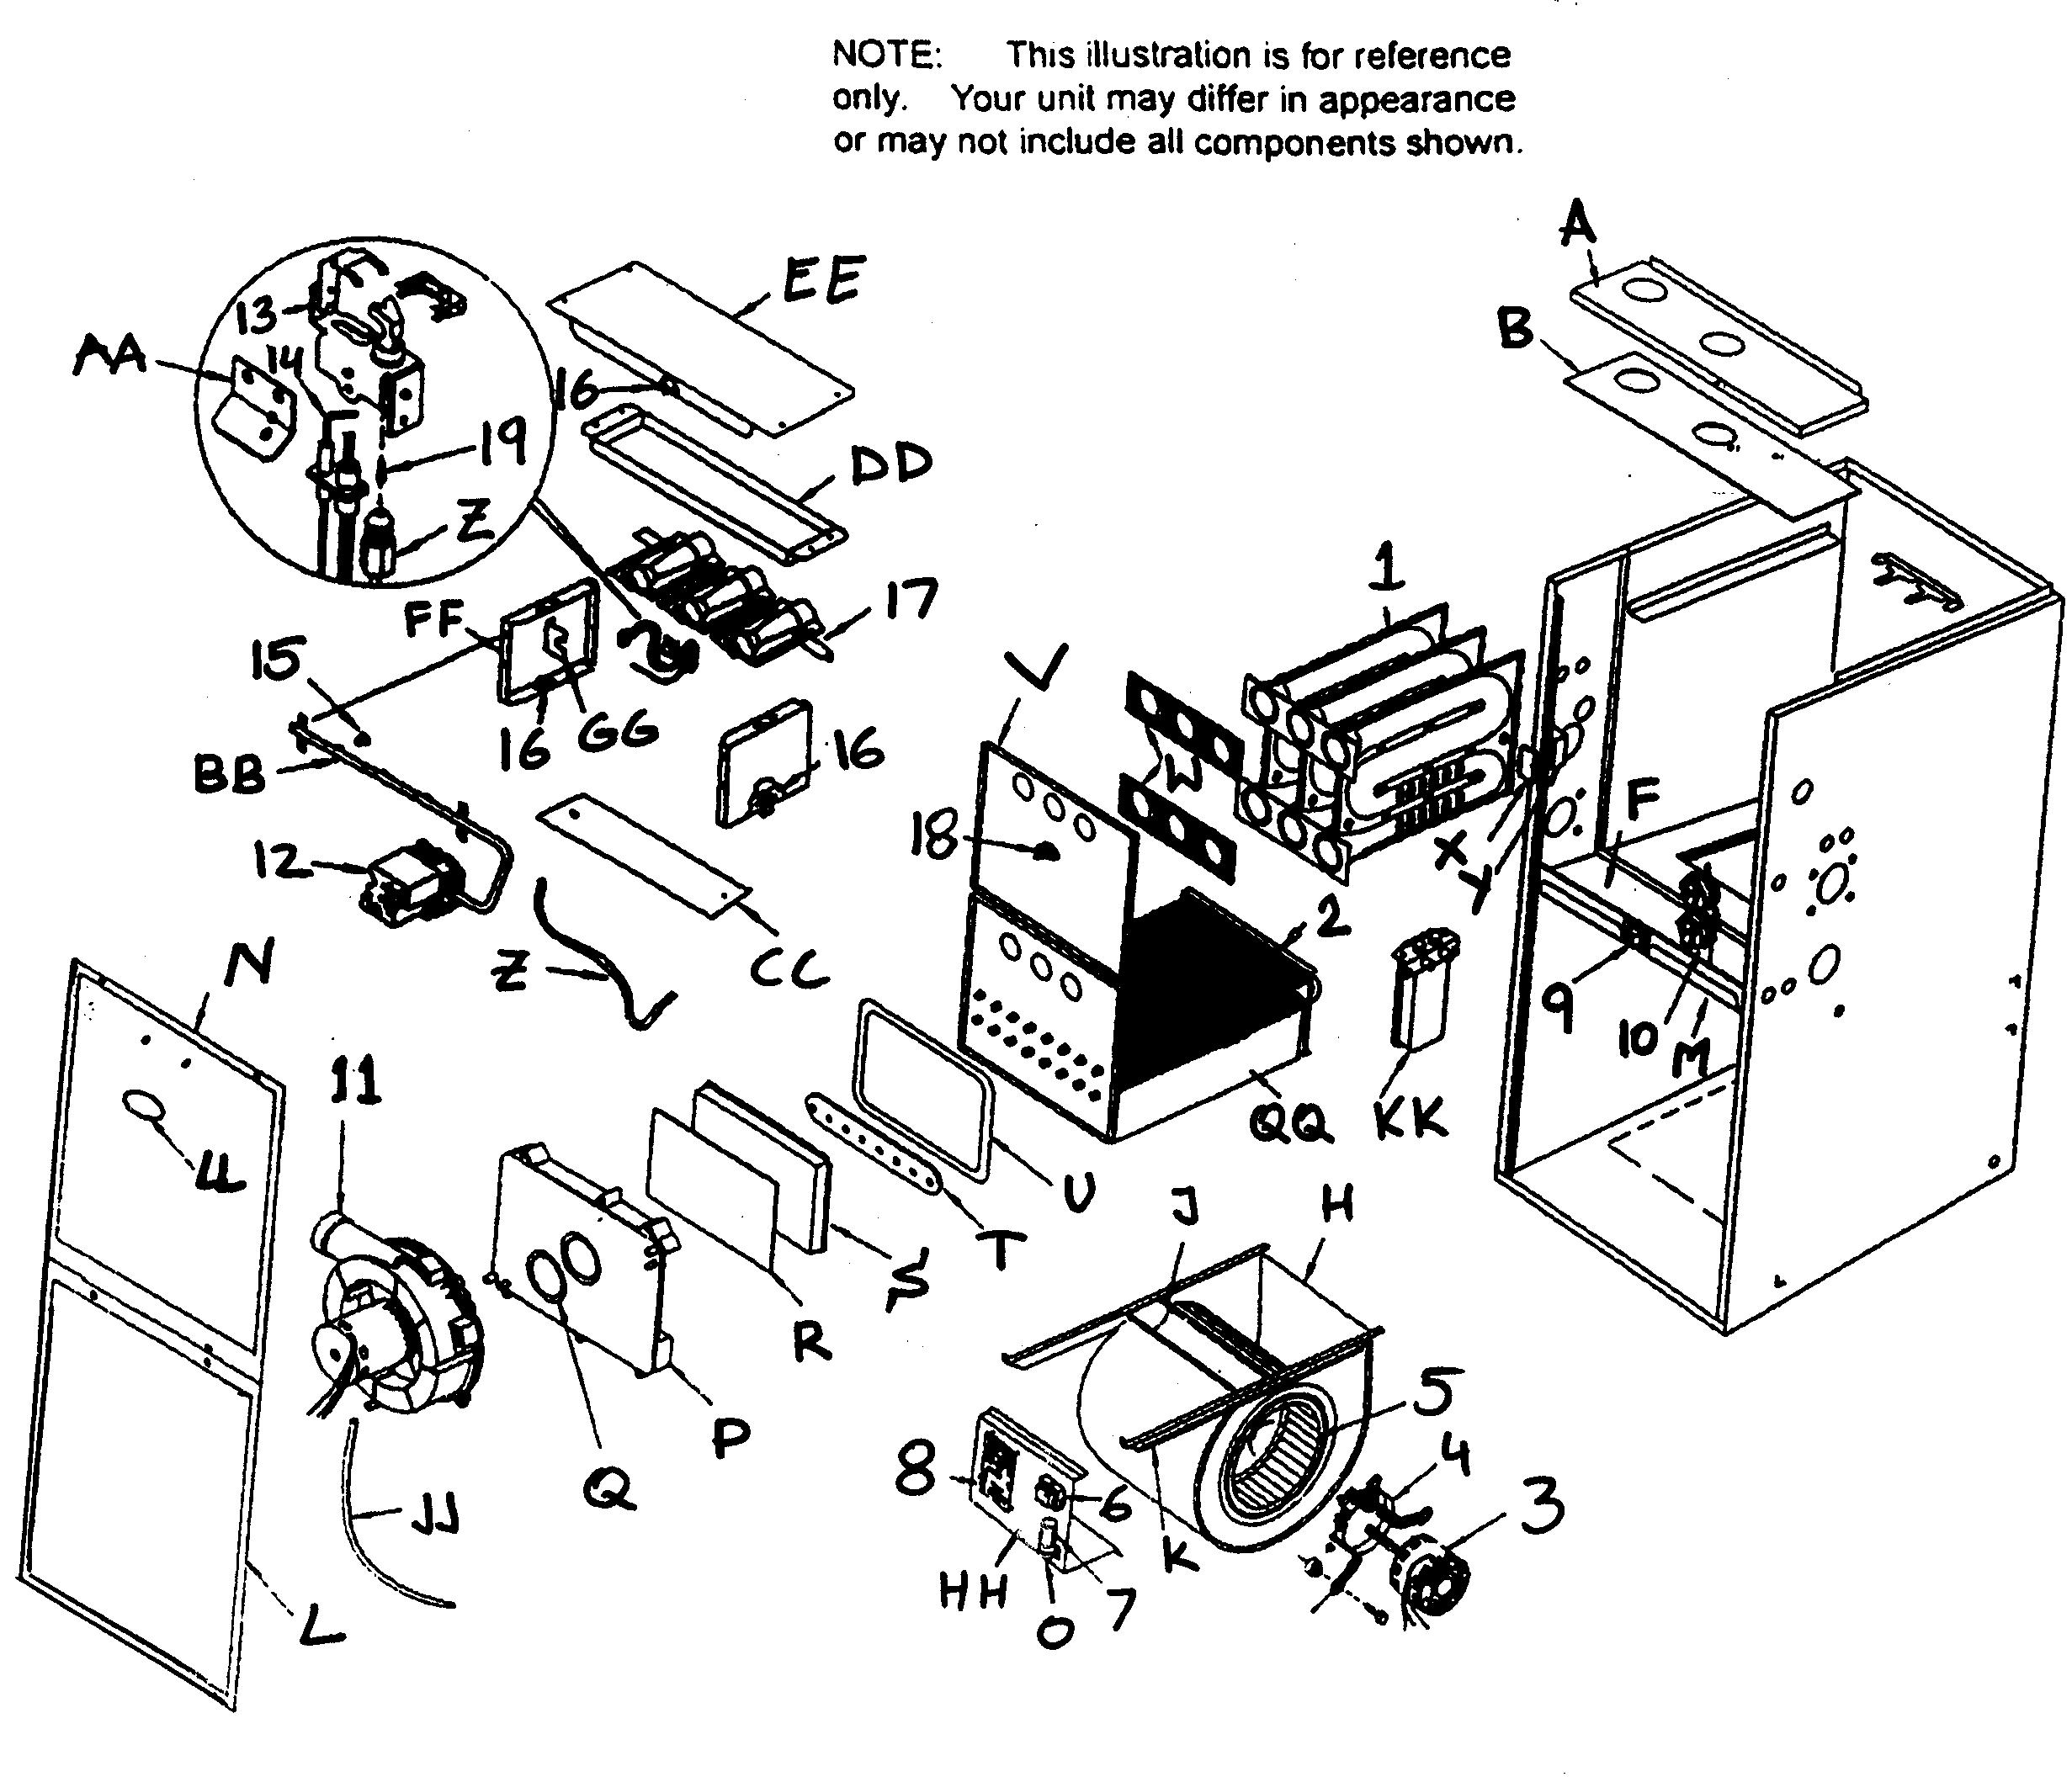 Wiring Model Tempstar Diagram